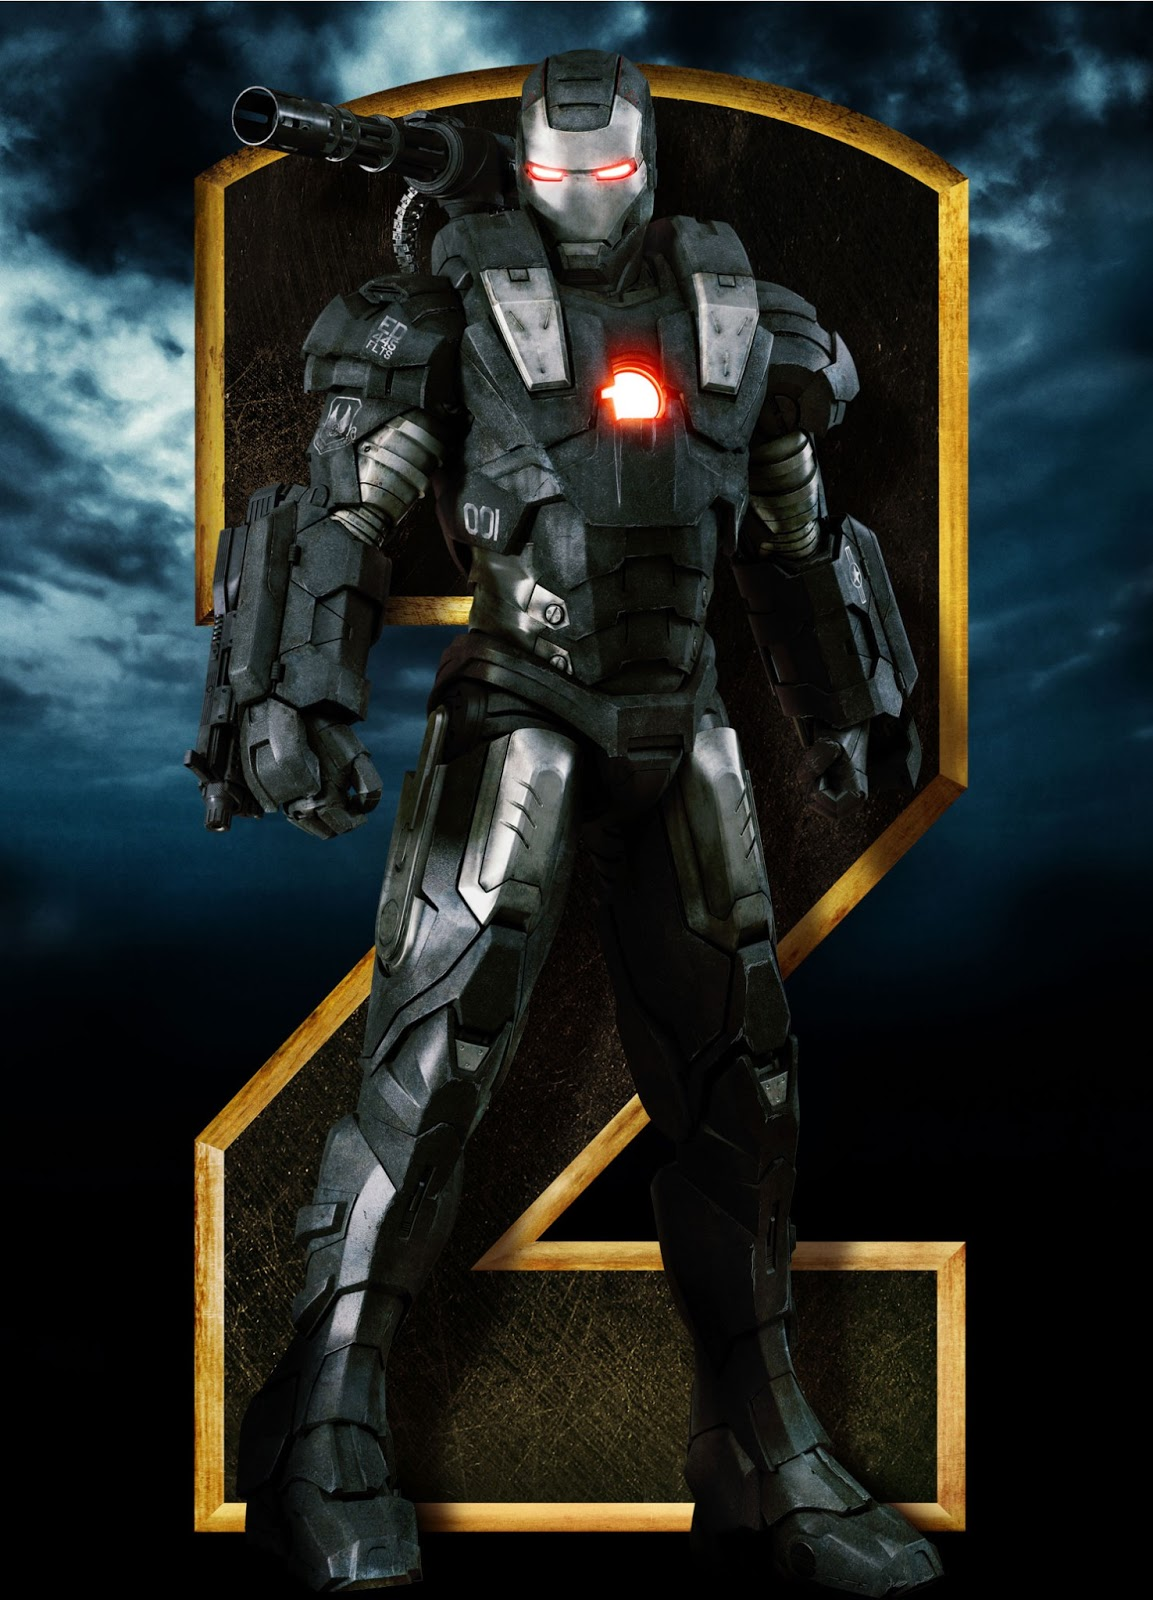 Image - Iron-man-2-war-machine-character-poster.jpg   Marvel ...